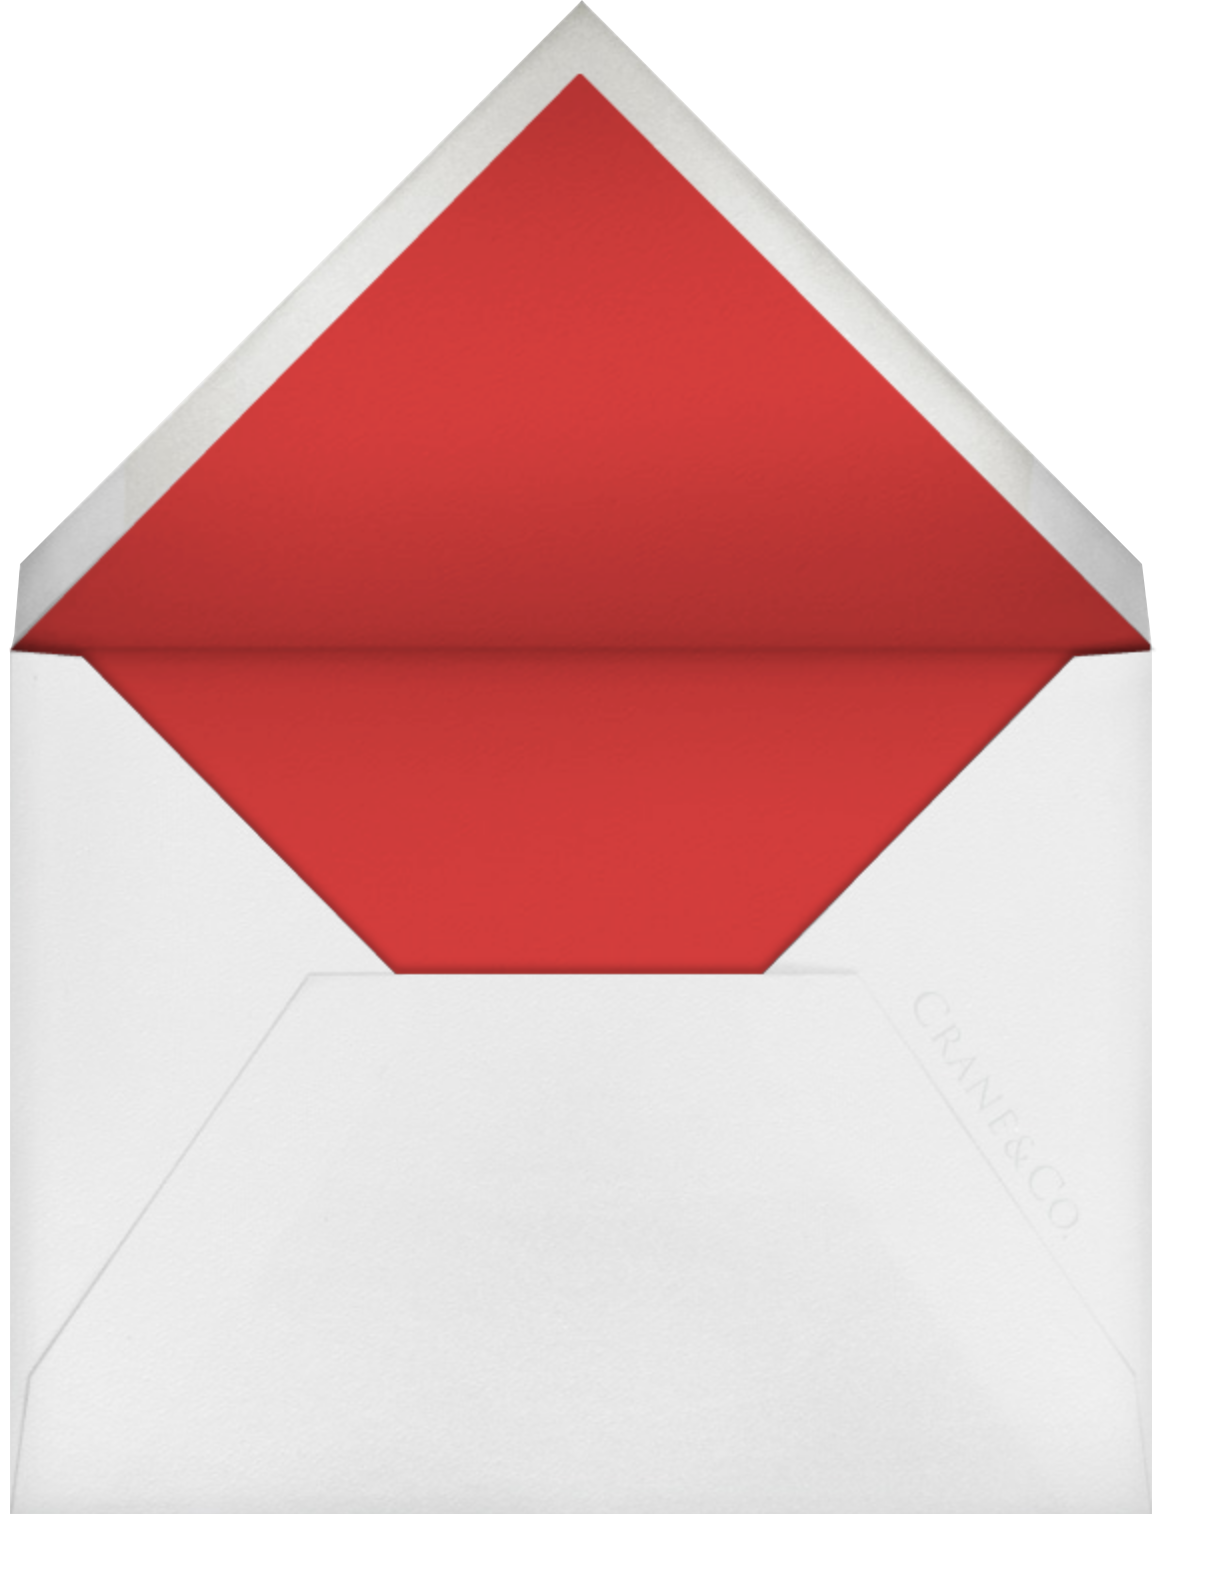 Floral Applique (Save the Date) - Red - Oscar de la Renta - Envelope